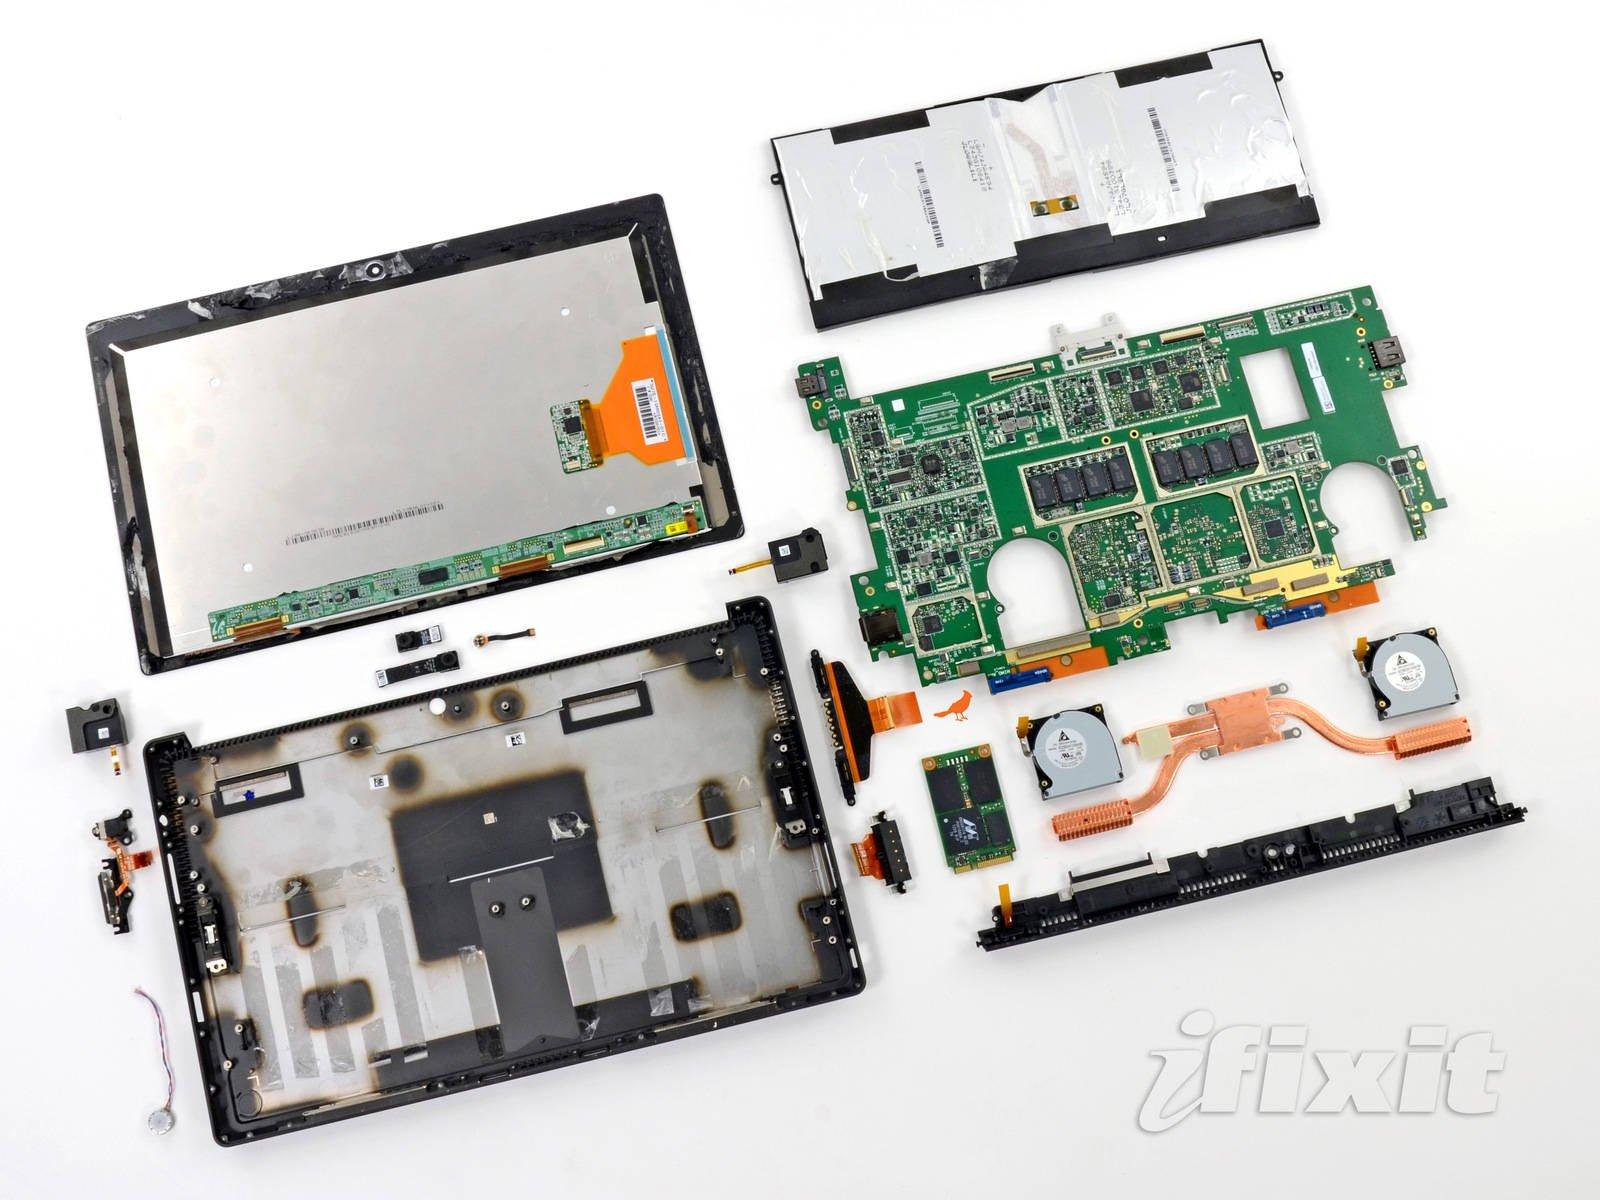 Microsoft Surface Laptop Teardown Auto Electrical Wiring Diagram Jvc R950bt Inside U0026 39 S Pro A Fiendishly Difficult